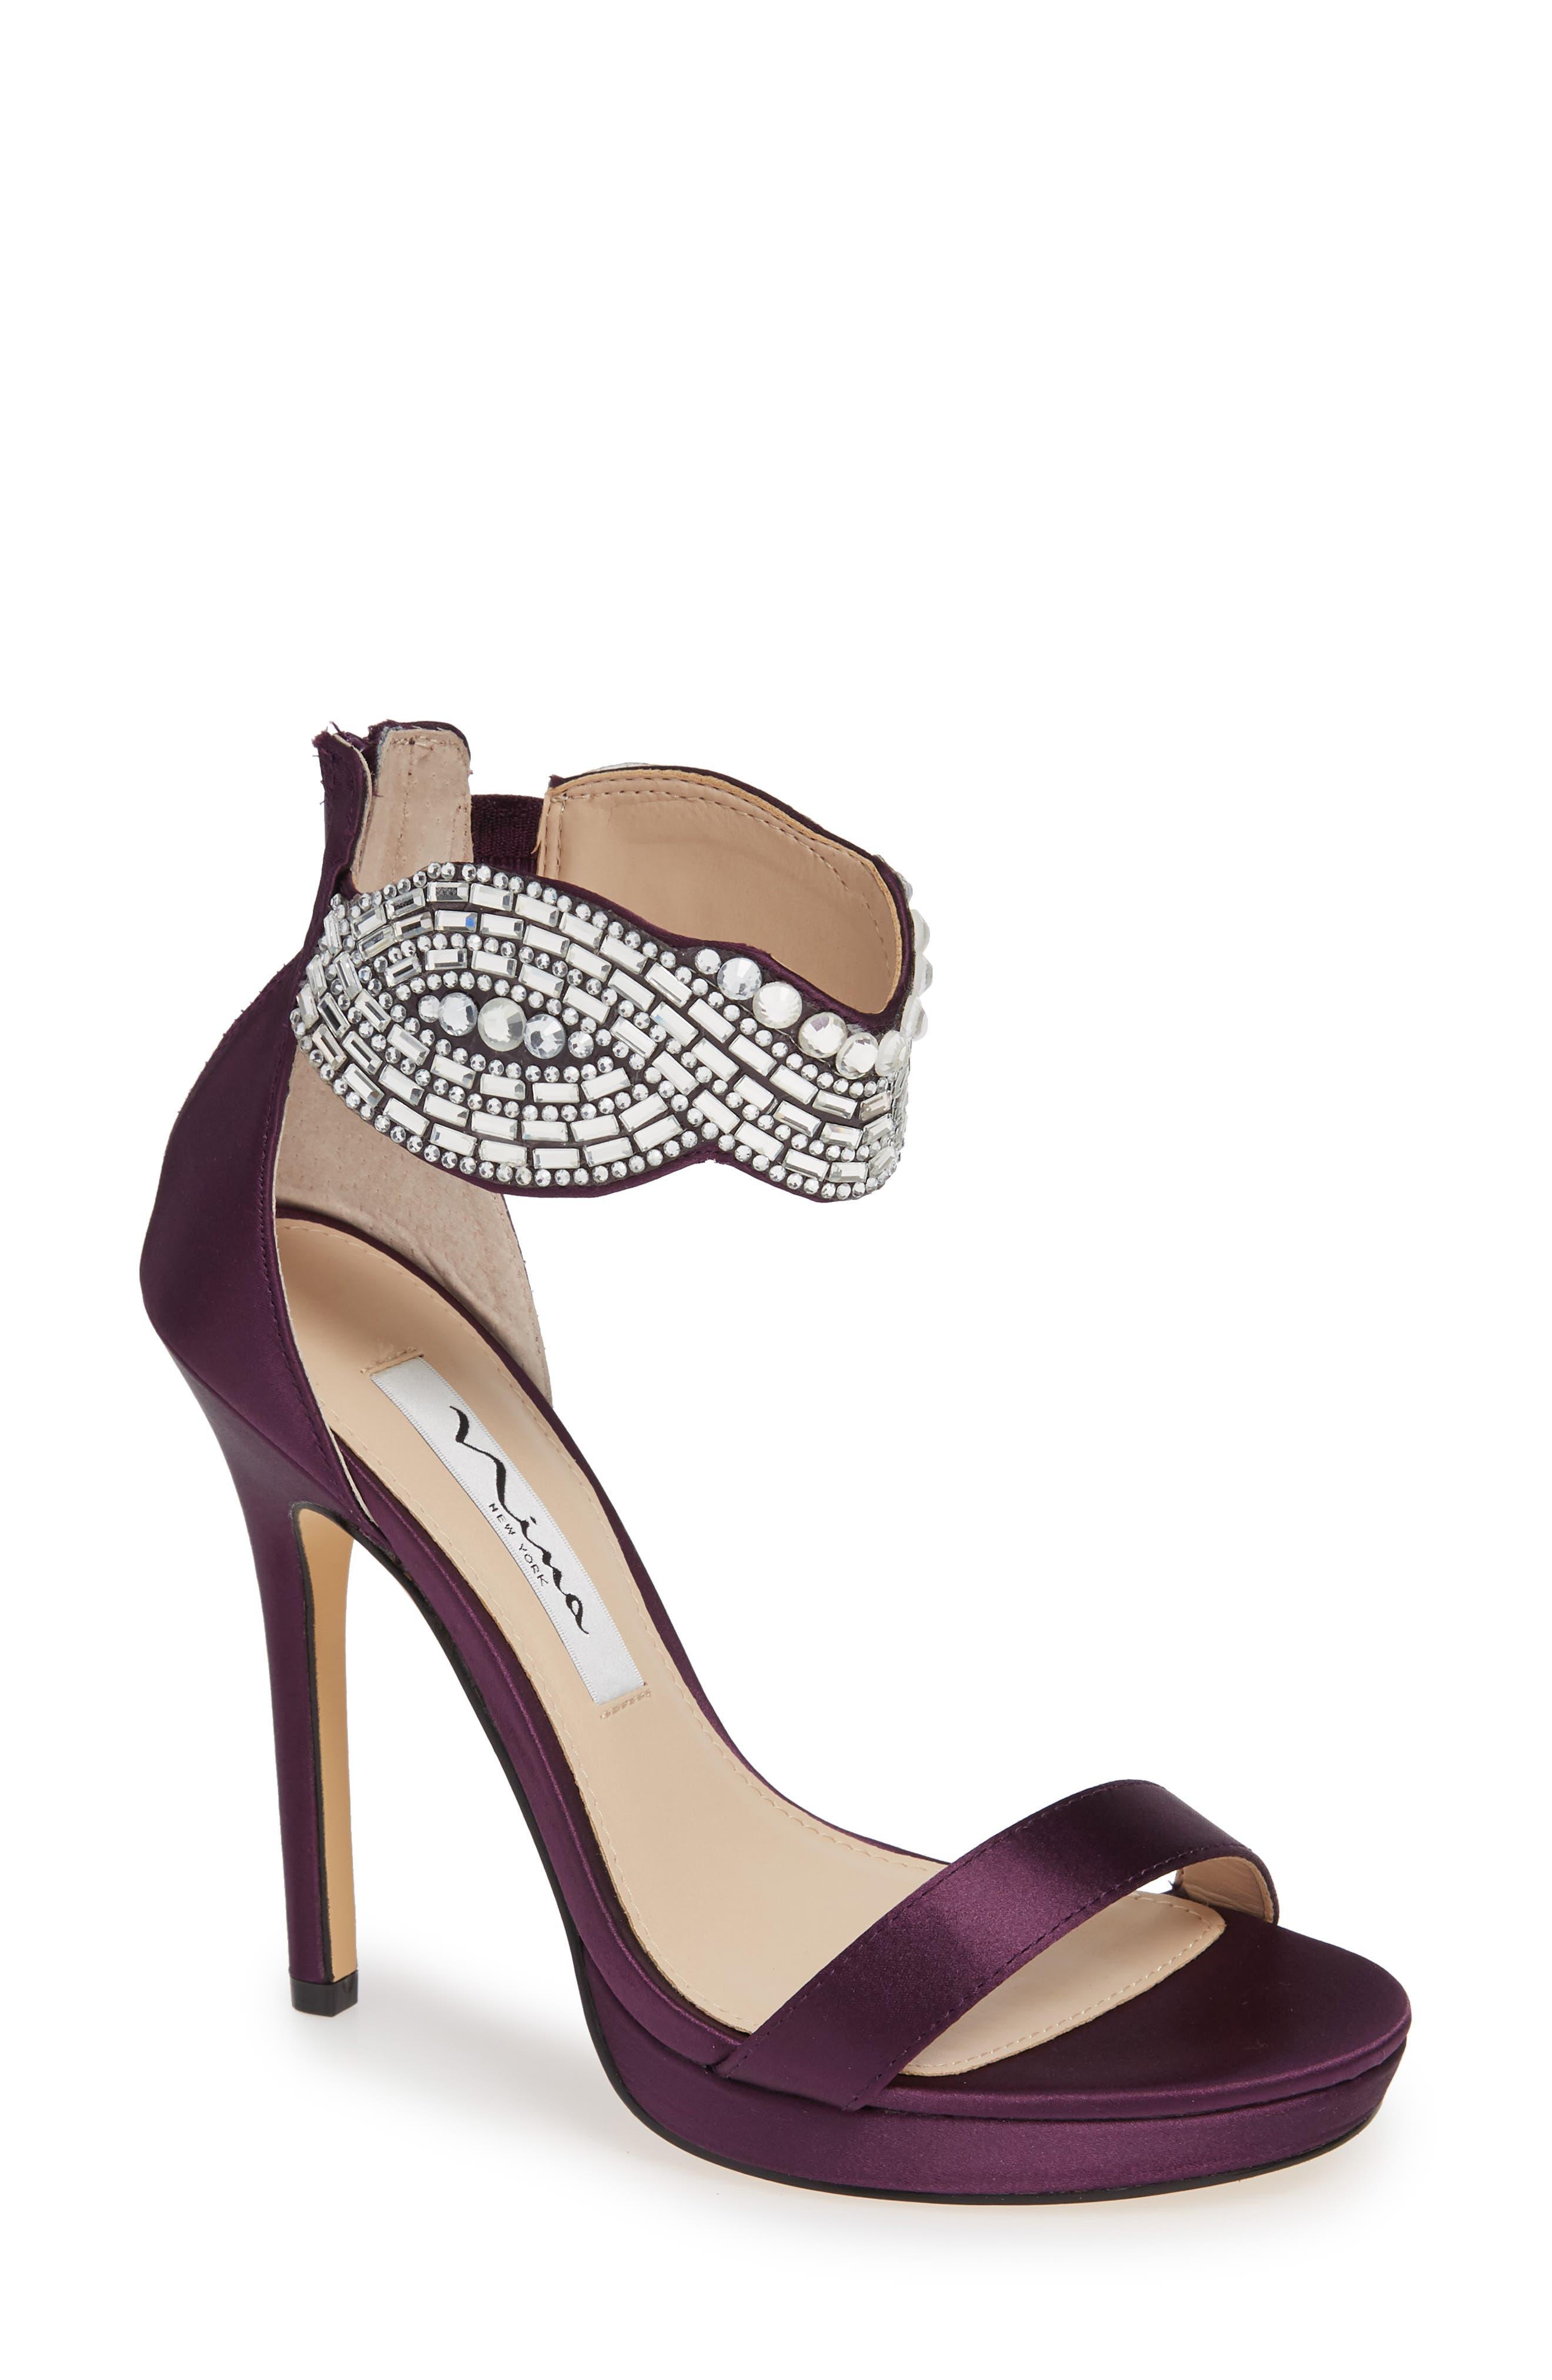 Fayth Jeweled Ankle Cuff Sandal, Main, color, EGGPLANT SATIN